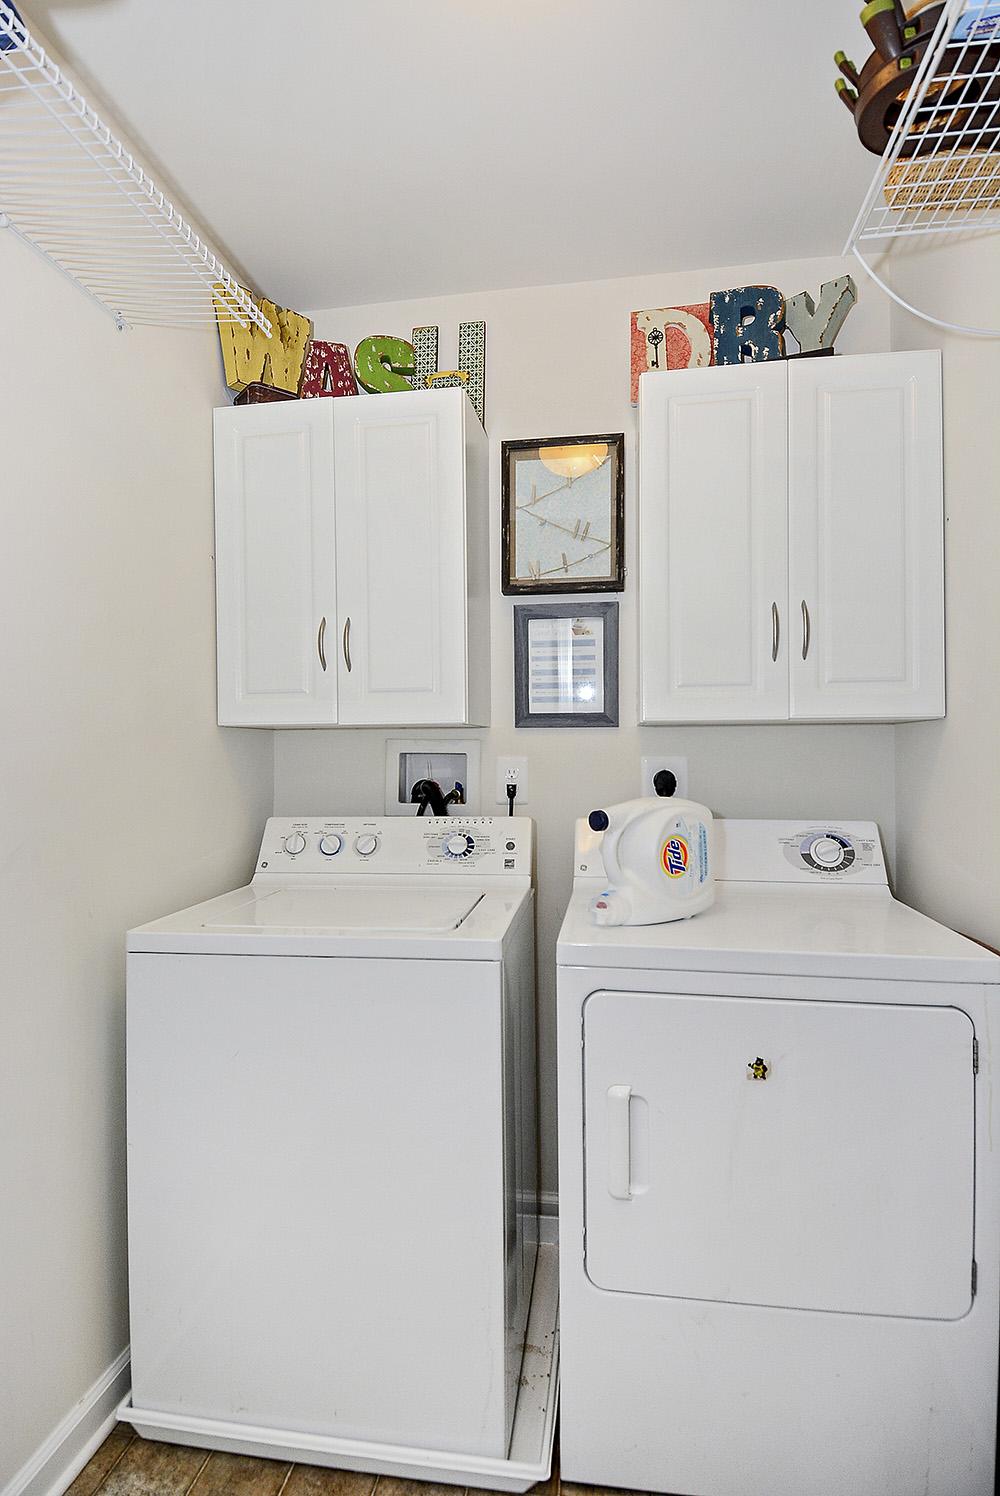 Print_Main Level-Washer and dryer..jpg